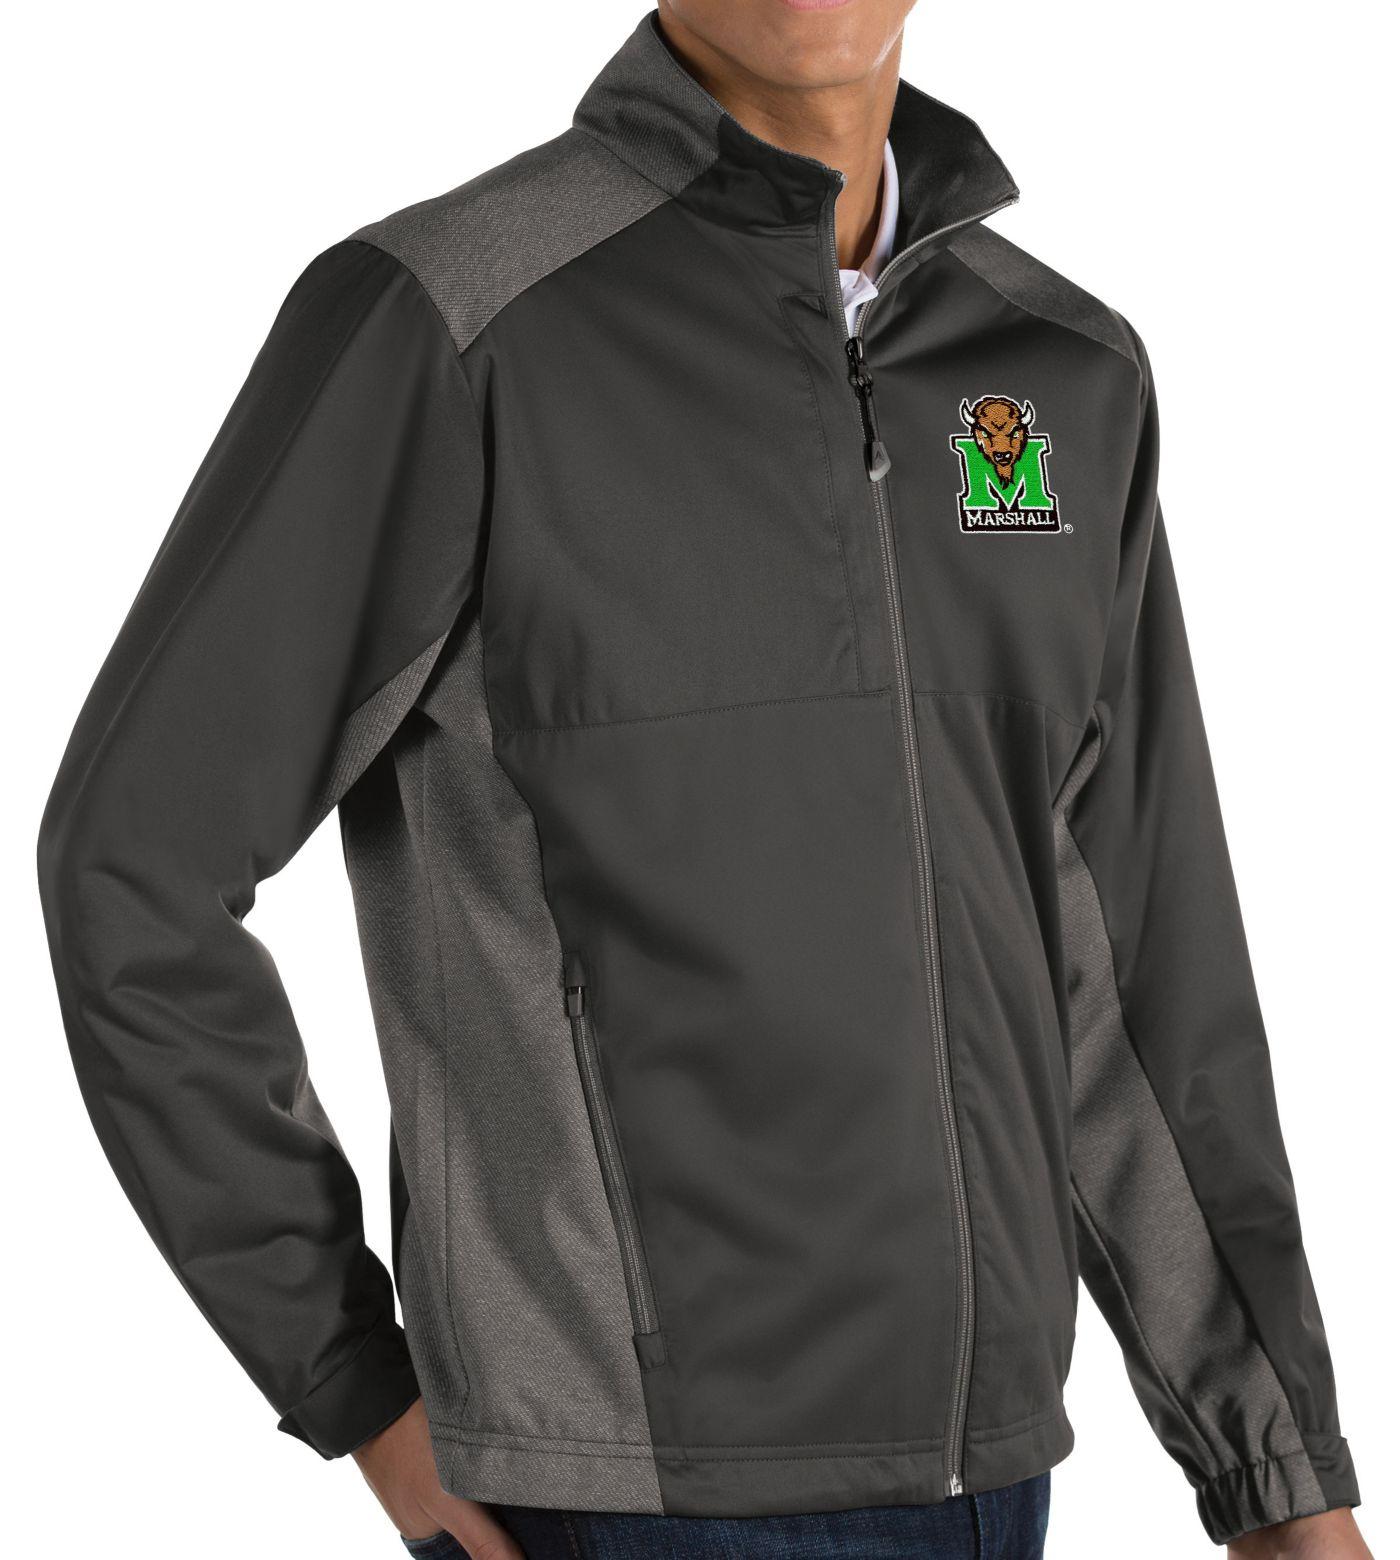 Antigua Men's Marshall Thundering Herd Grey Revolve Full-Zip Jacket